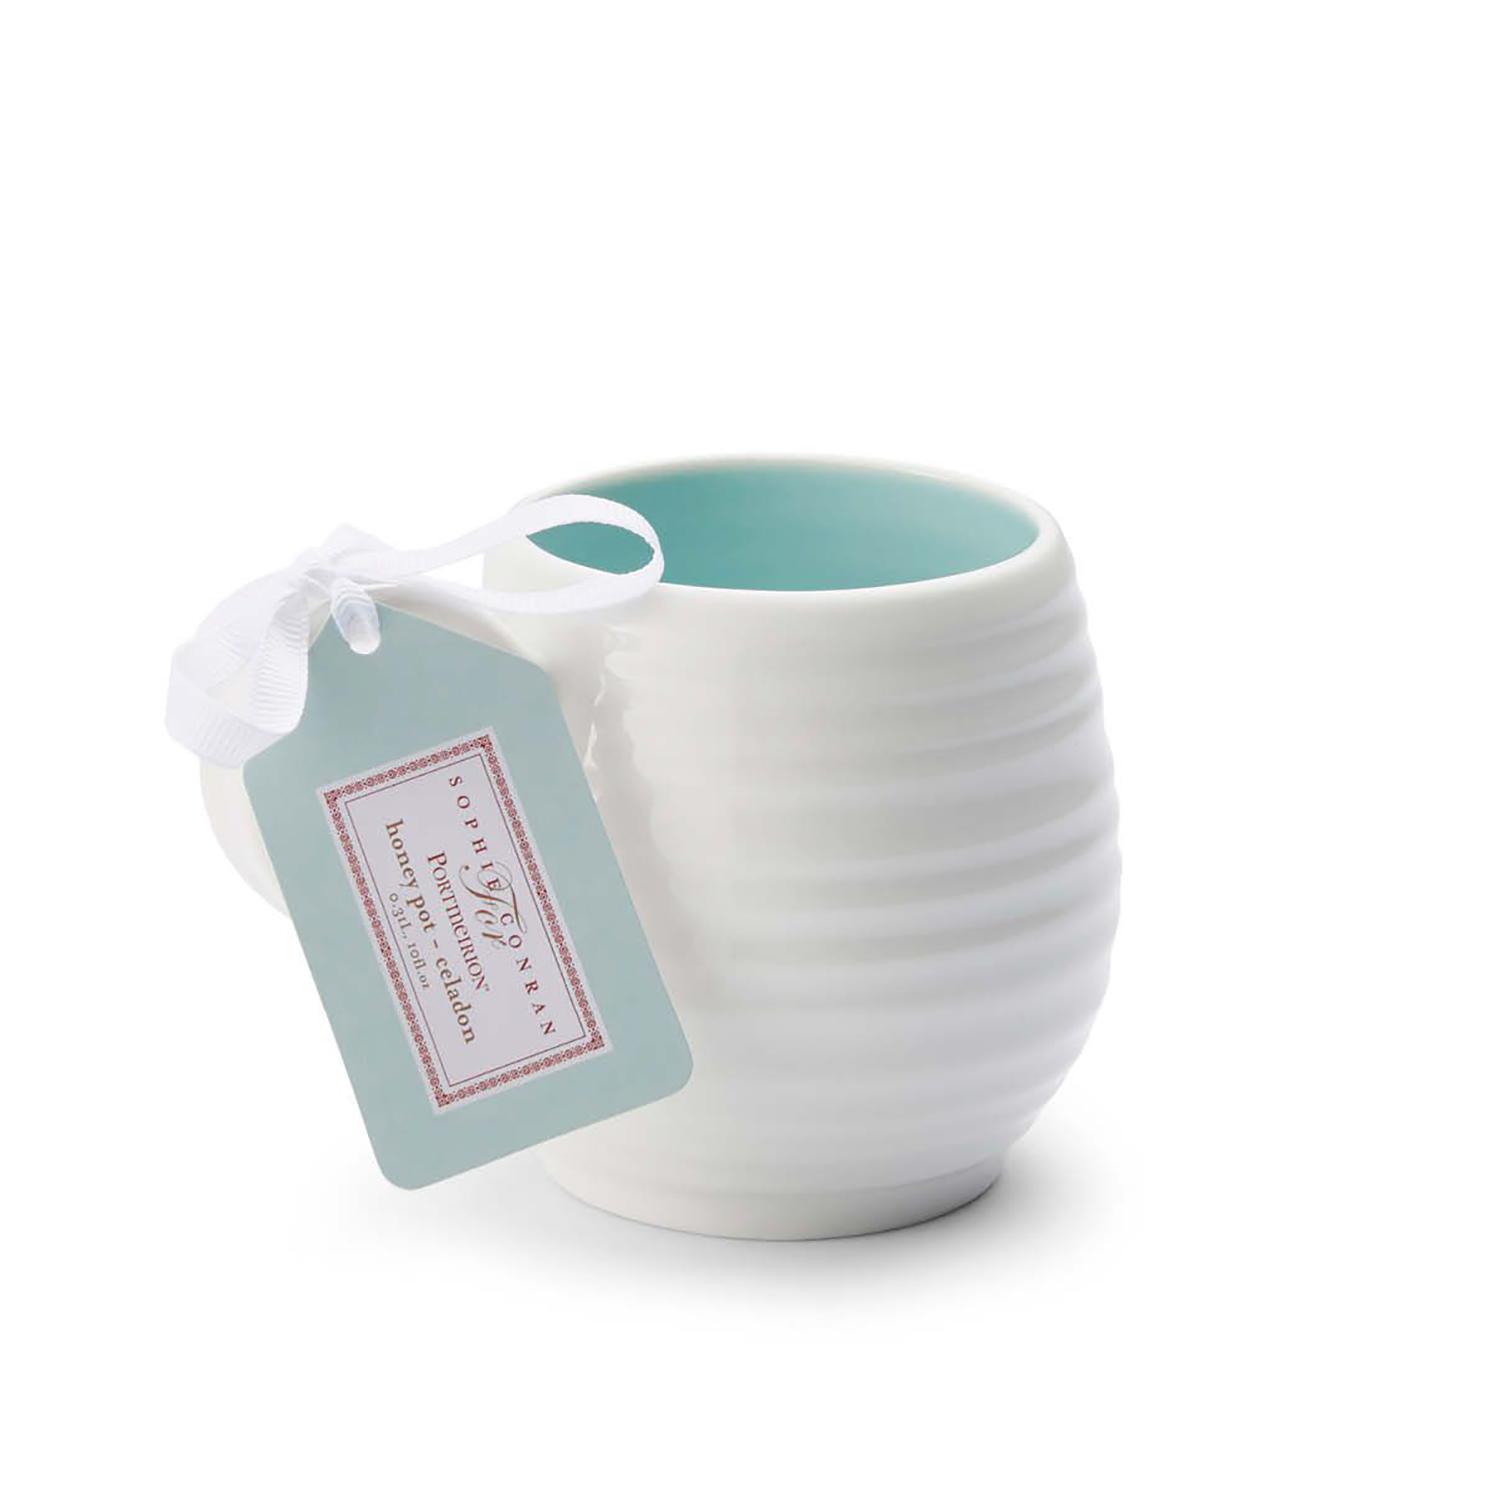 Sophie Conran for Portmeirion – Set of 4 Honey Pot Celadon Barrel Mugs in Box